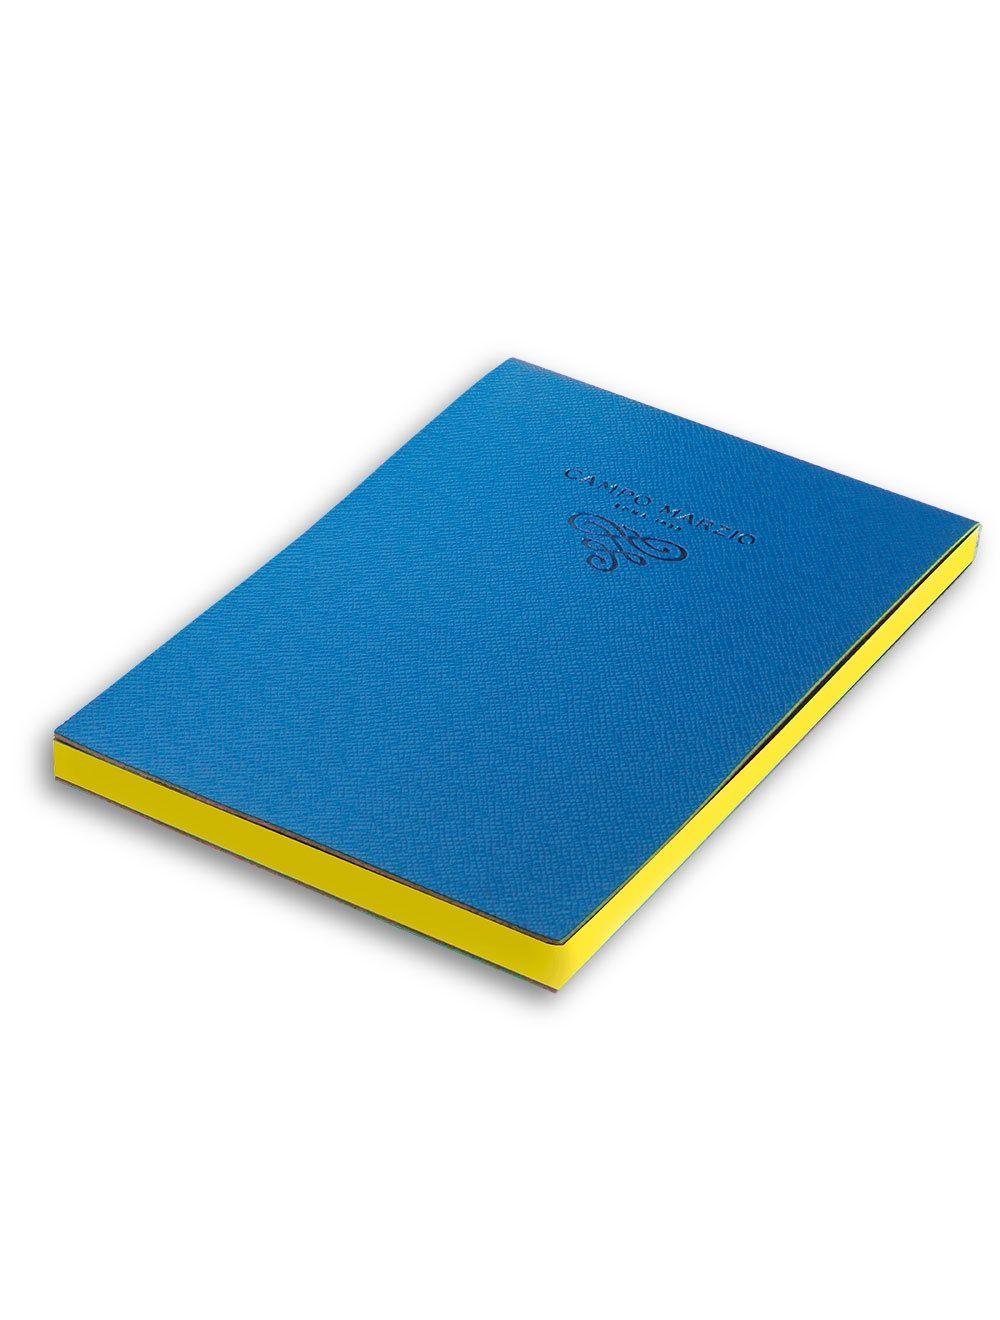 Blocco Notes 15 x 21 cm Saffiano - Blu Oceano